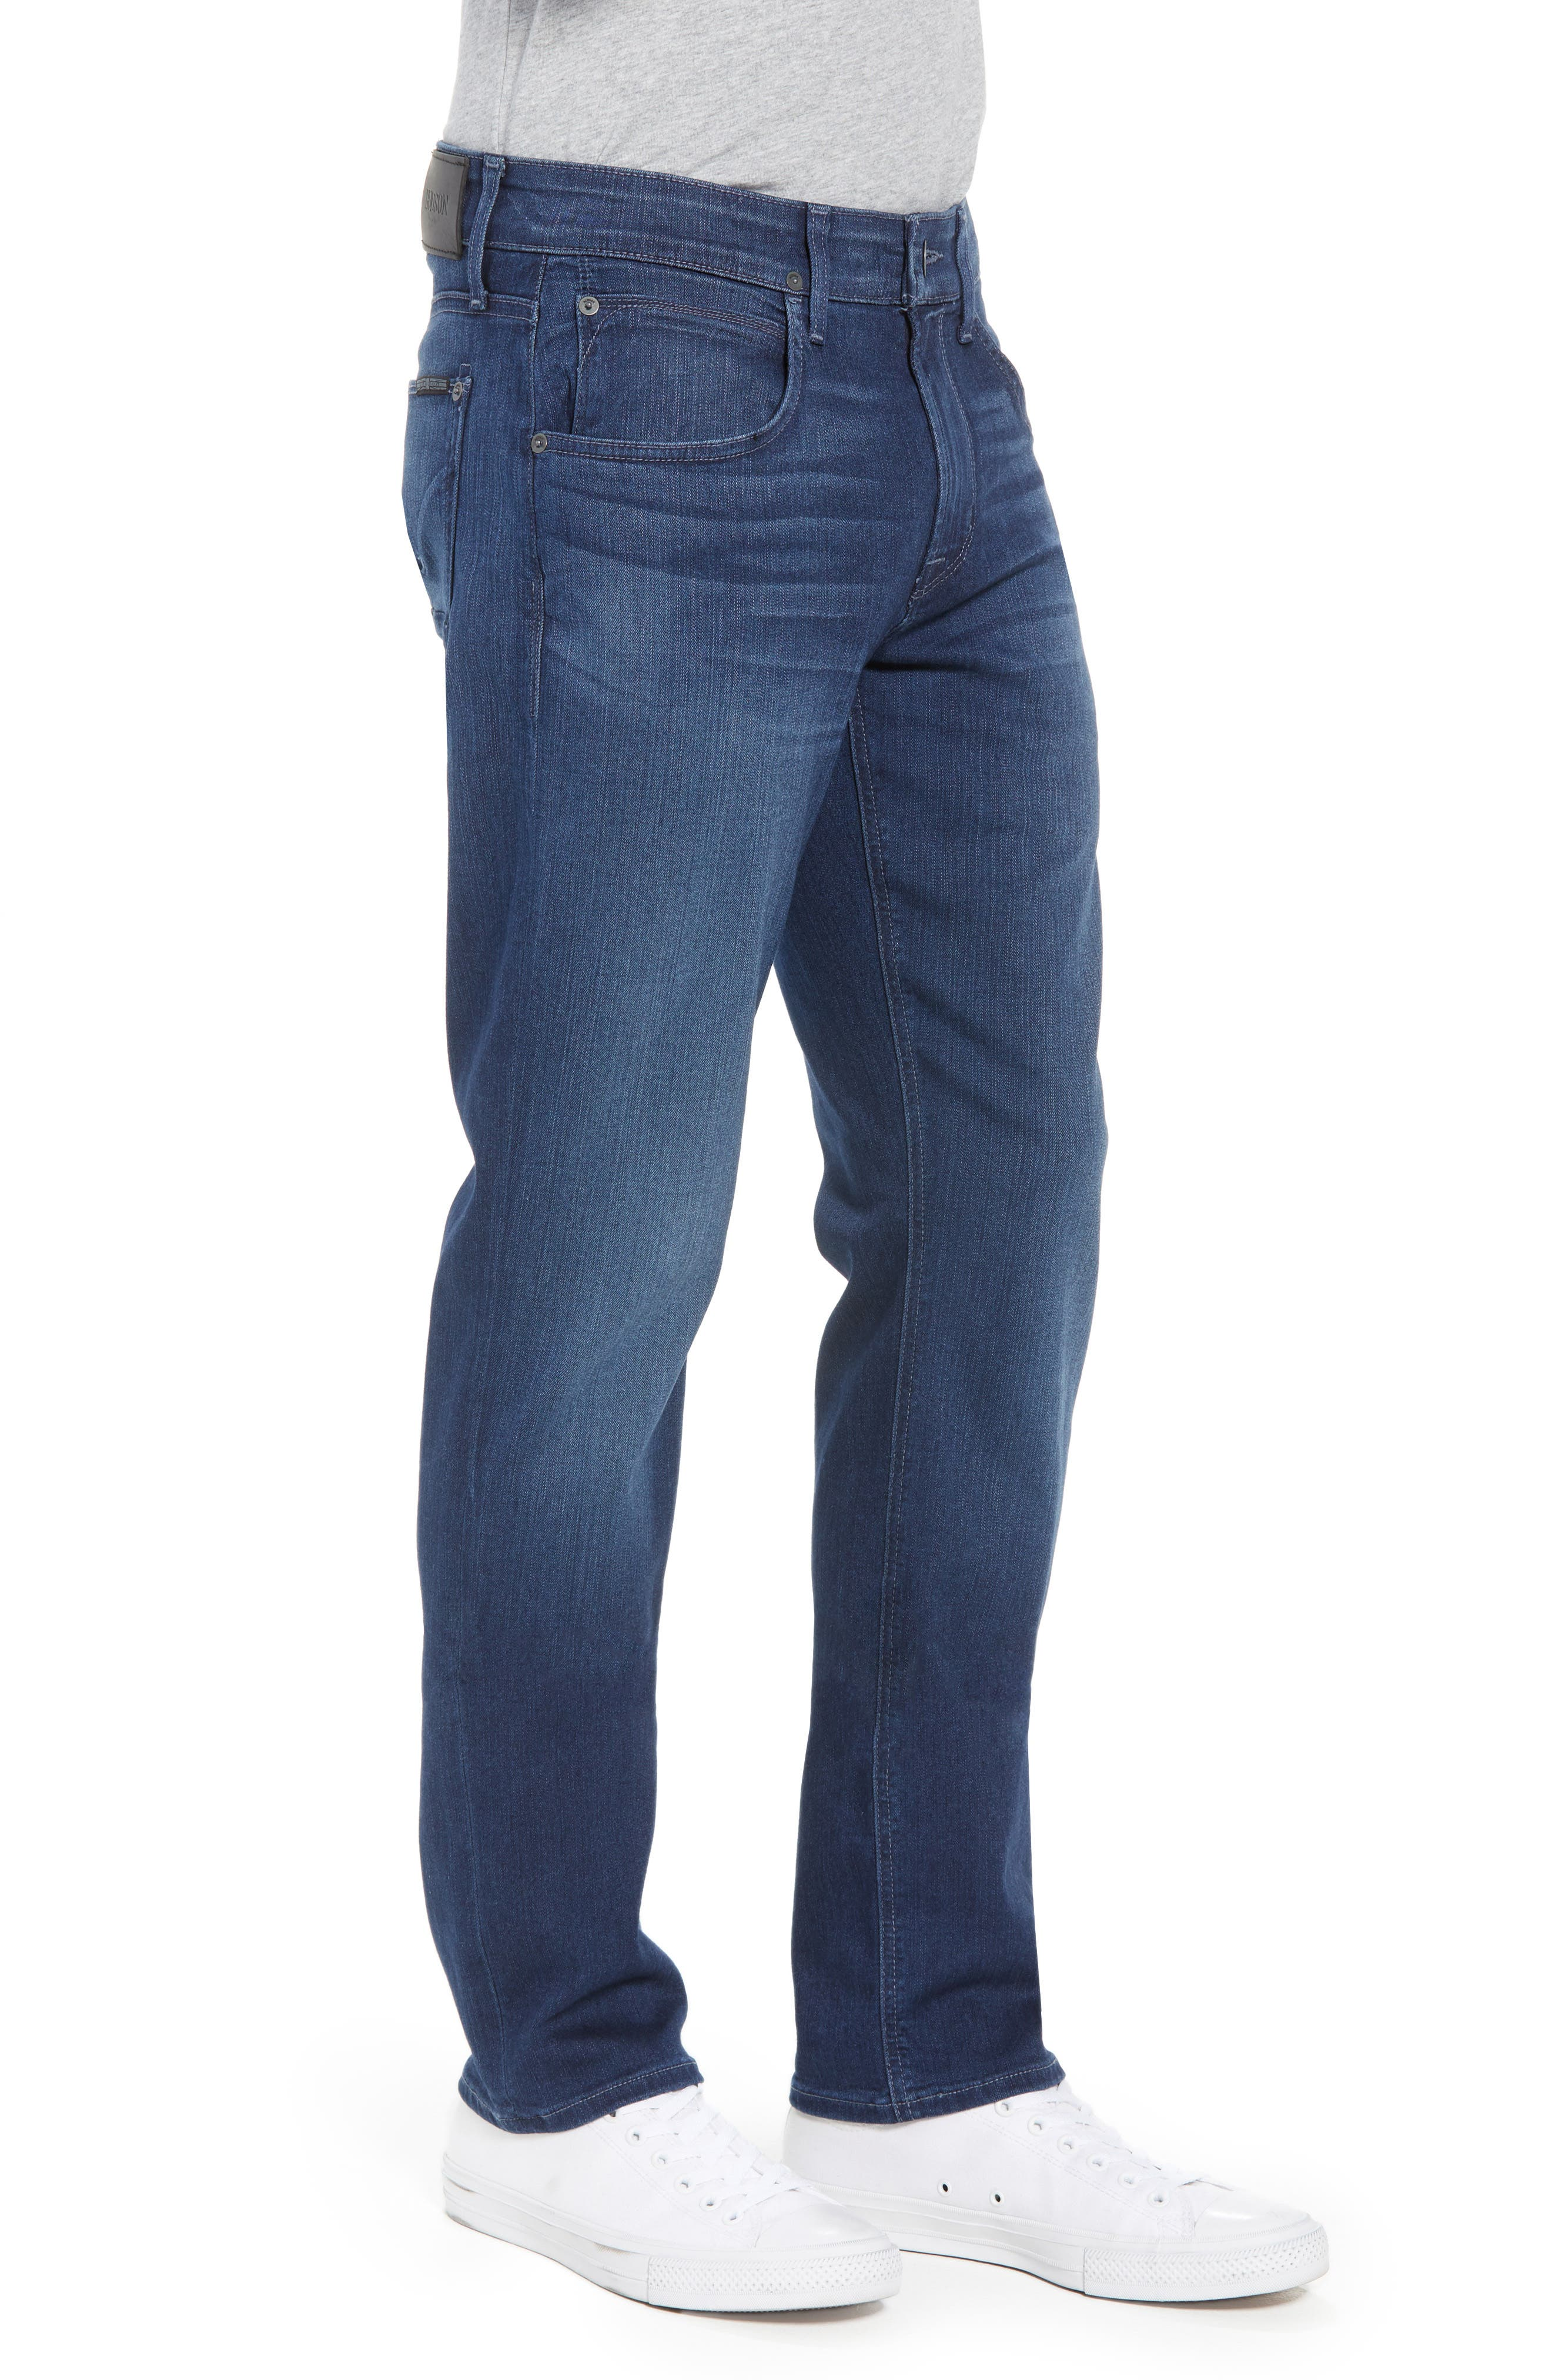 Byron Slim Straight Leg Jeans,                             Alternate thumbnail 4, color,                             Freeman